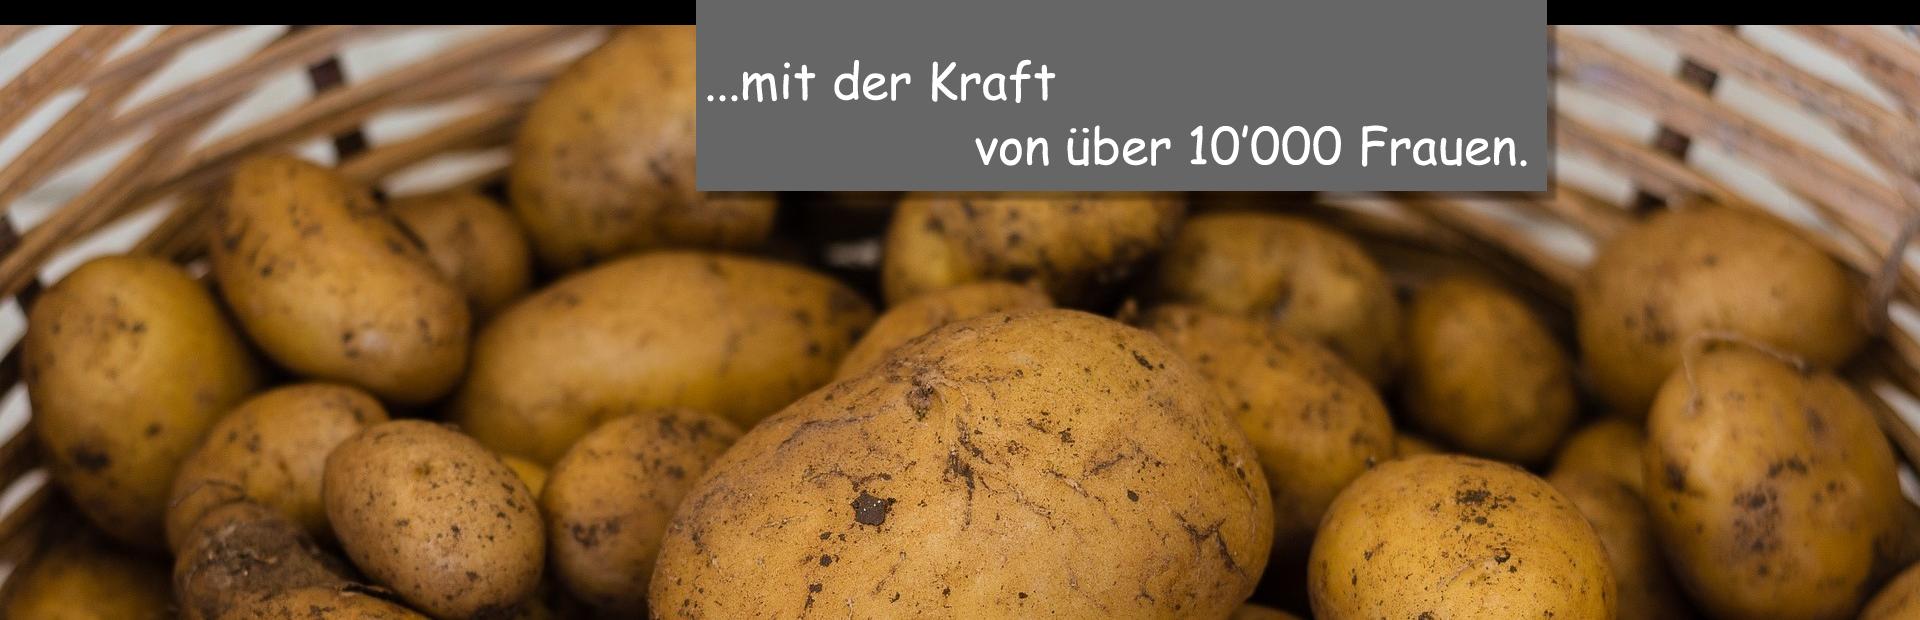 Kartoffeln_Kraft